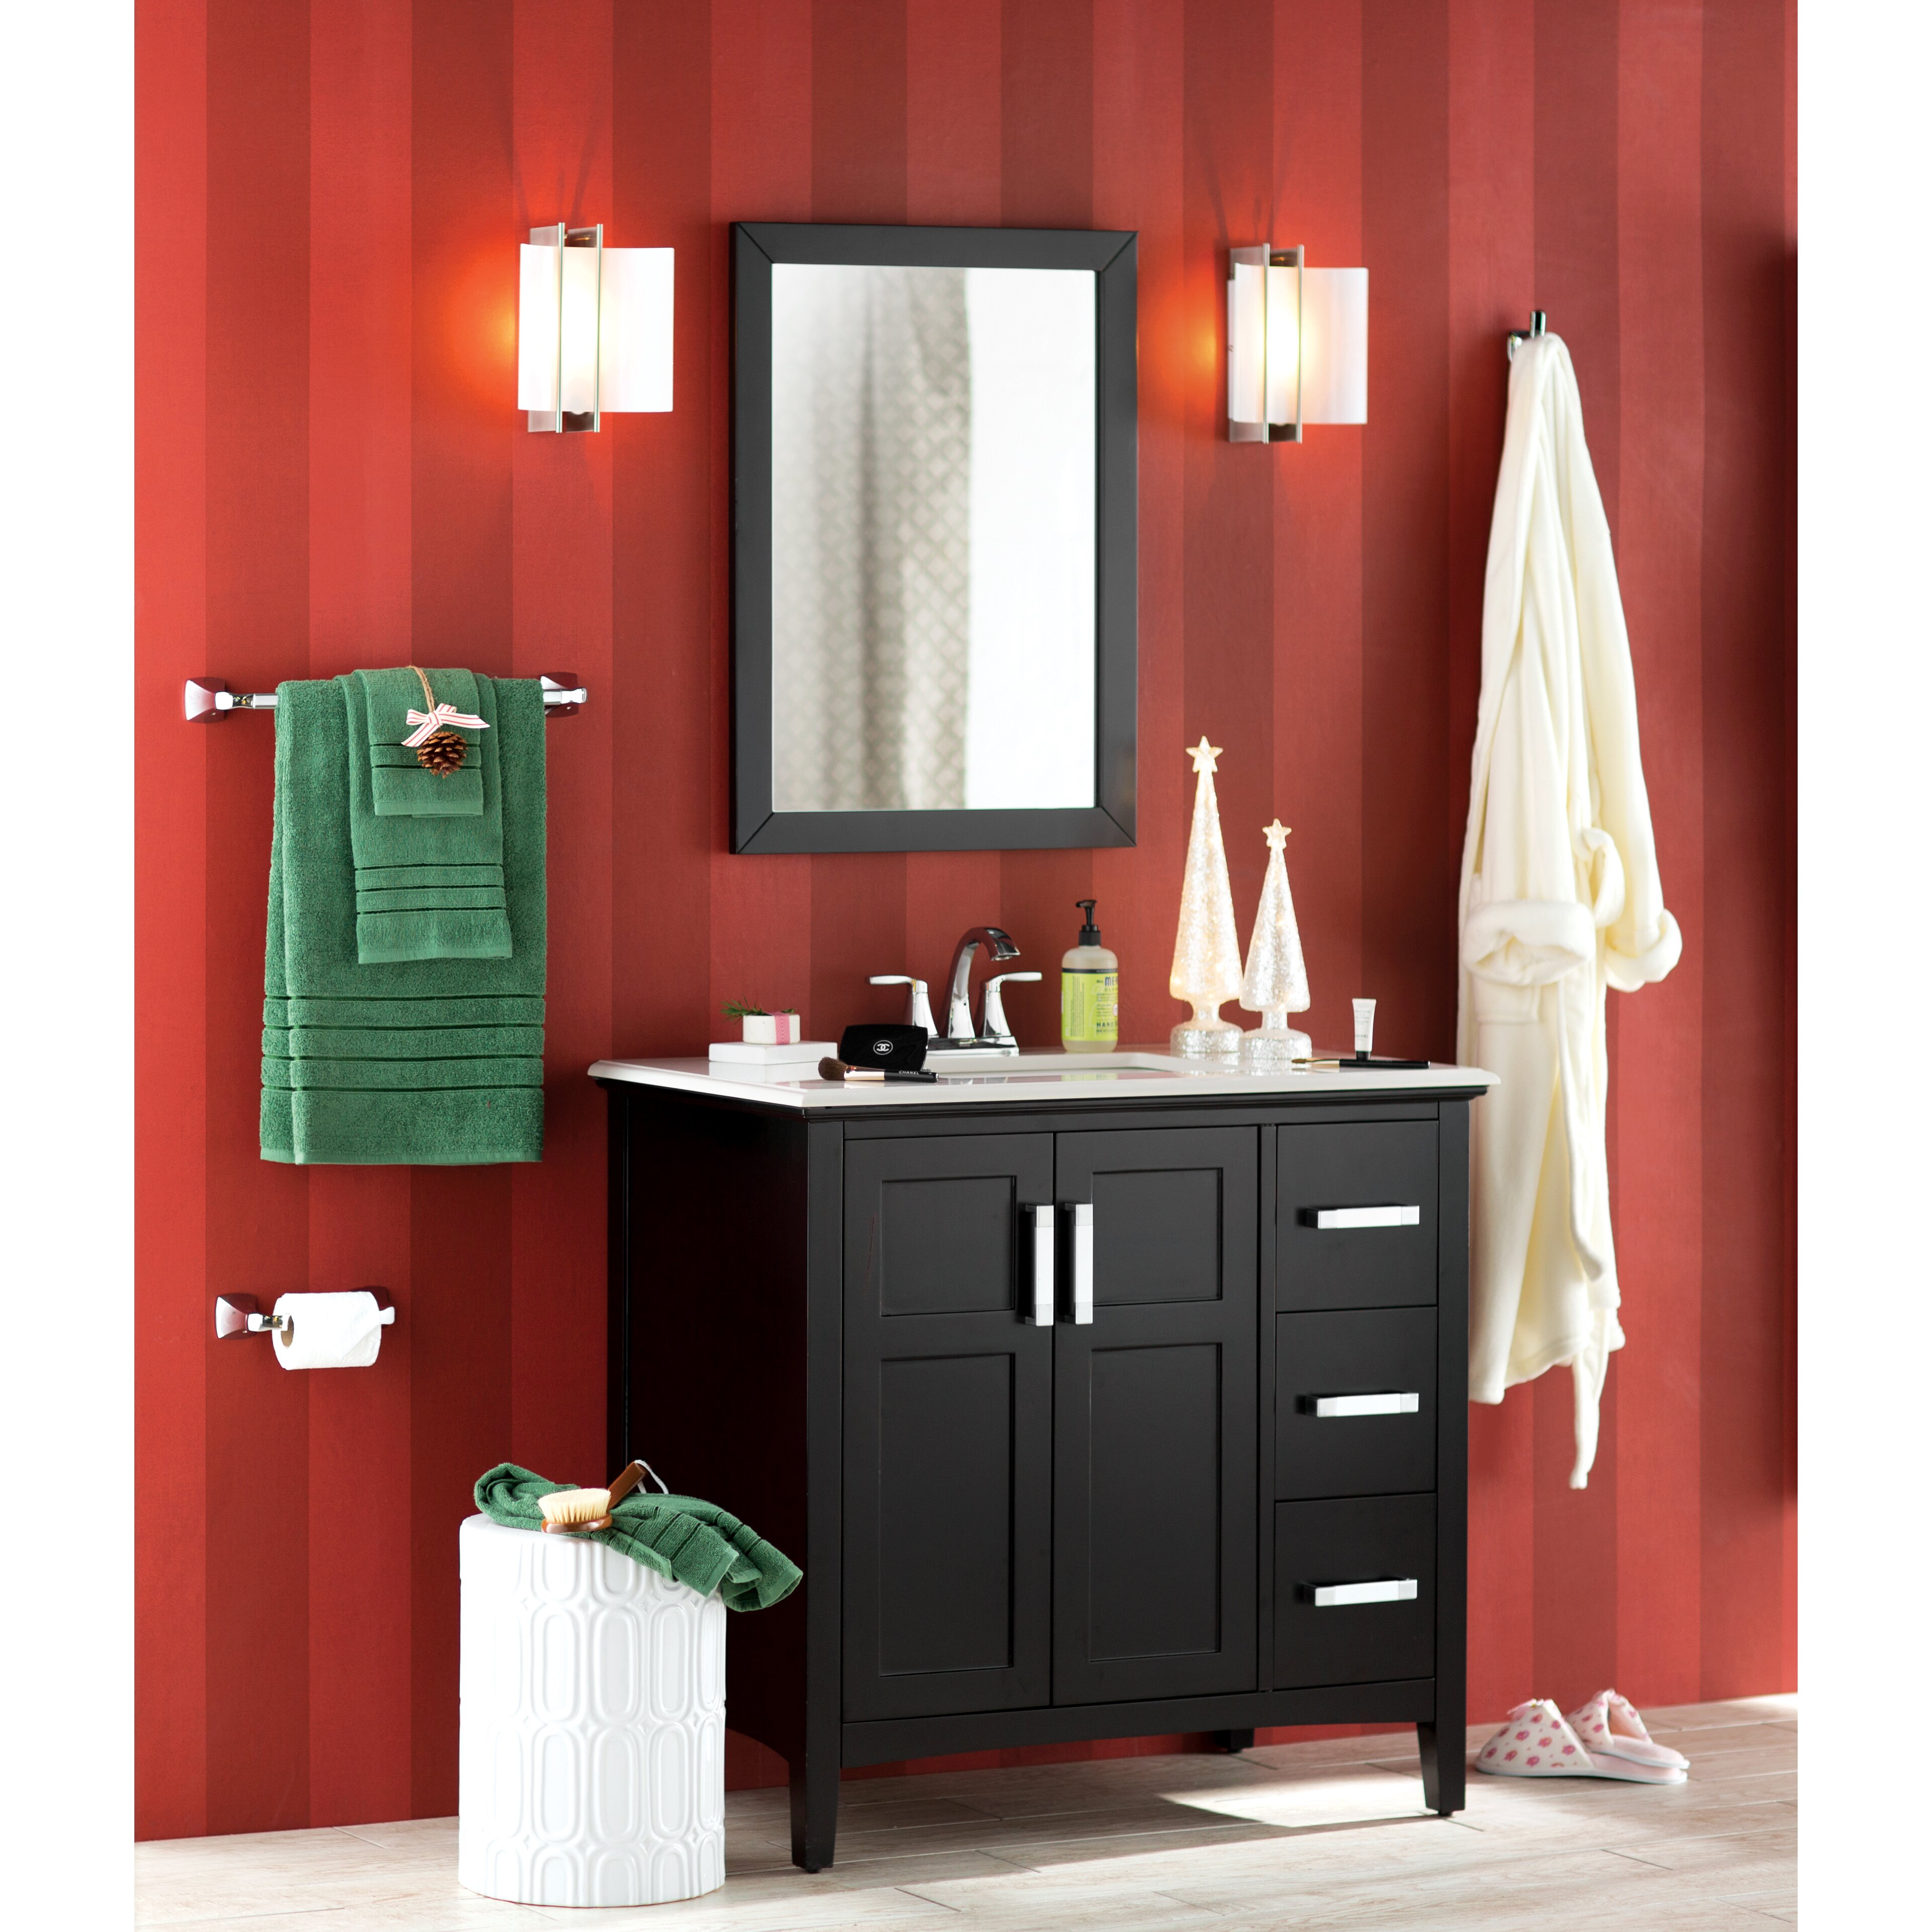 wade logan elmer bathroom vanity mirror reviews wayfair. Black Bedroom Furniture Sets. Home Design Ideas